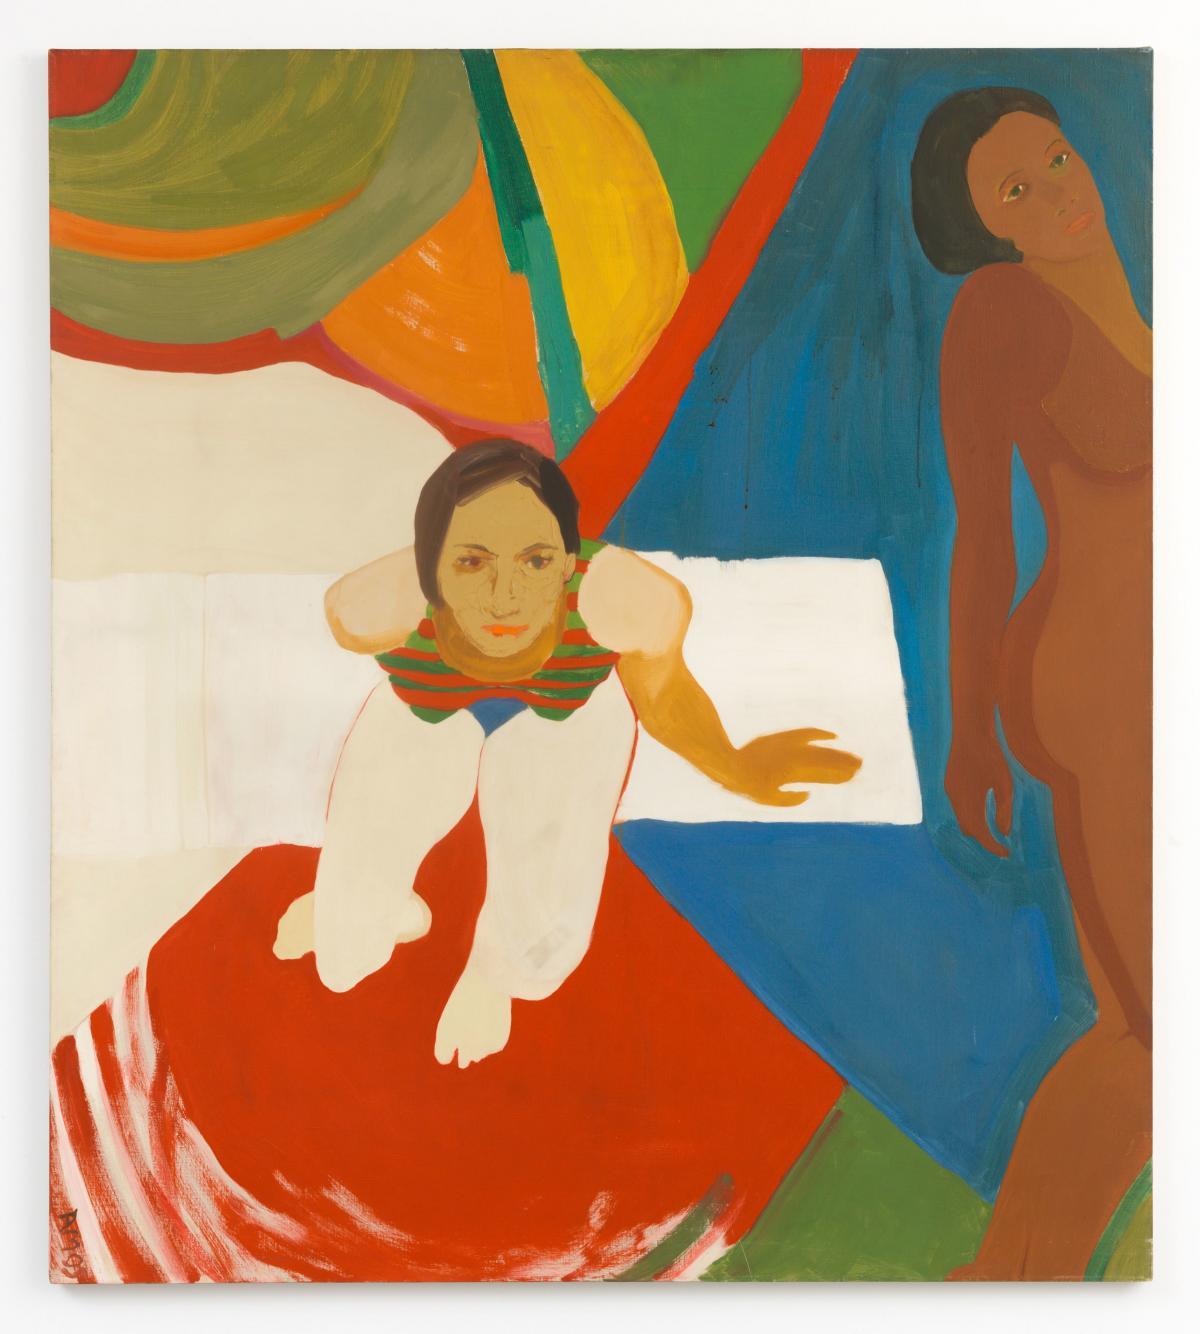 Emma Amos, Seated Figure and Nude, 1966